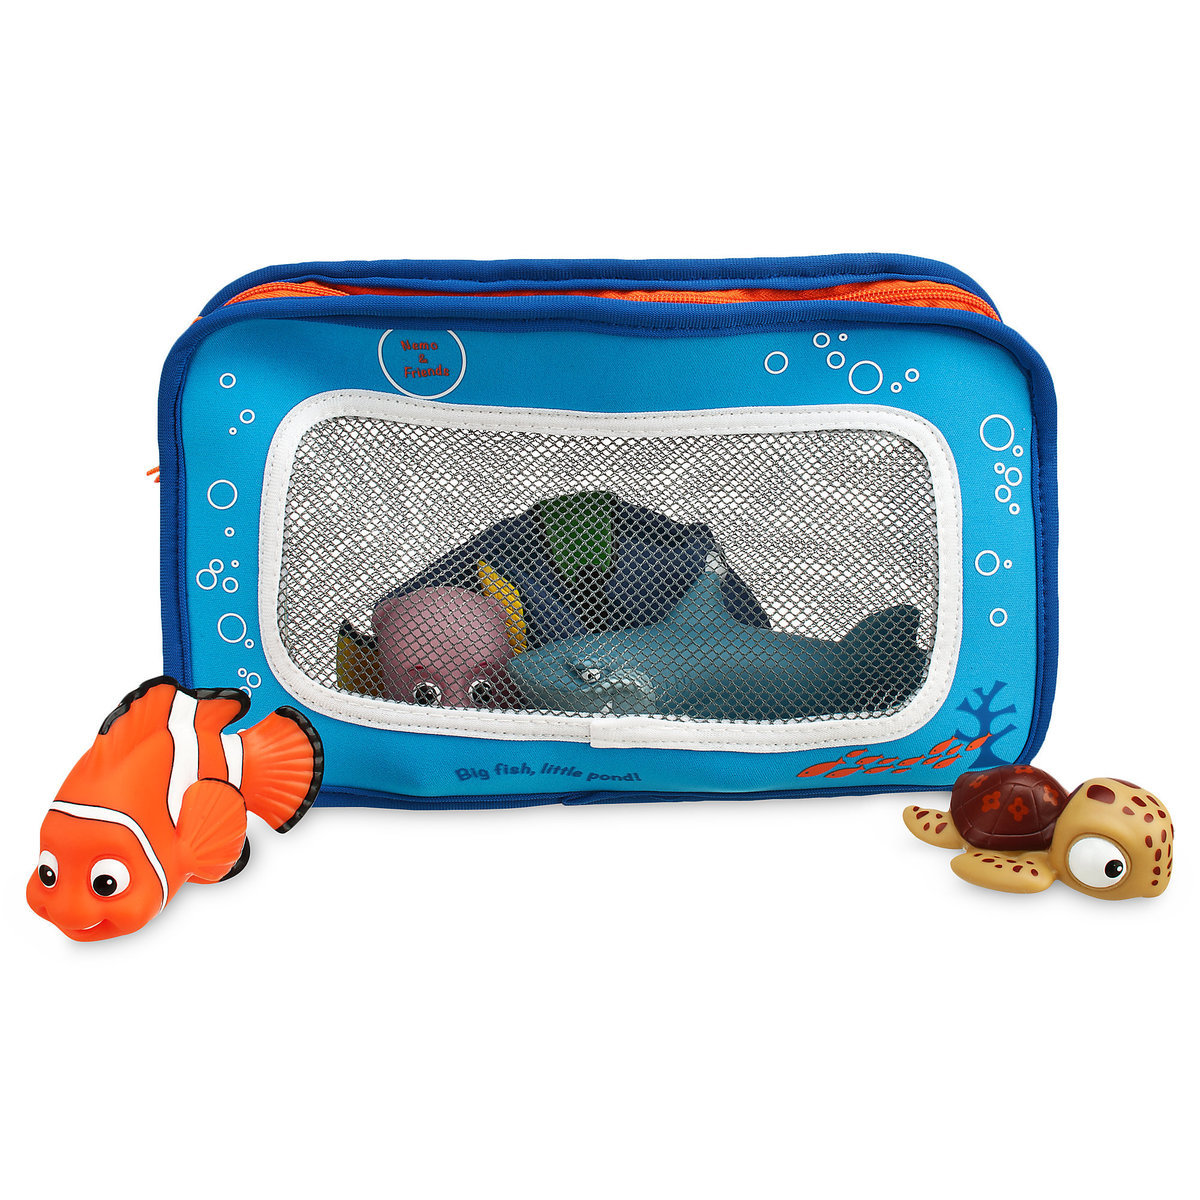 Finding Nemo Bath Toys for Baby   shopDisney